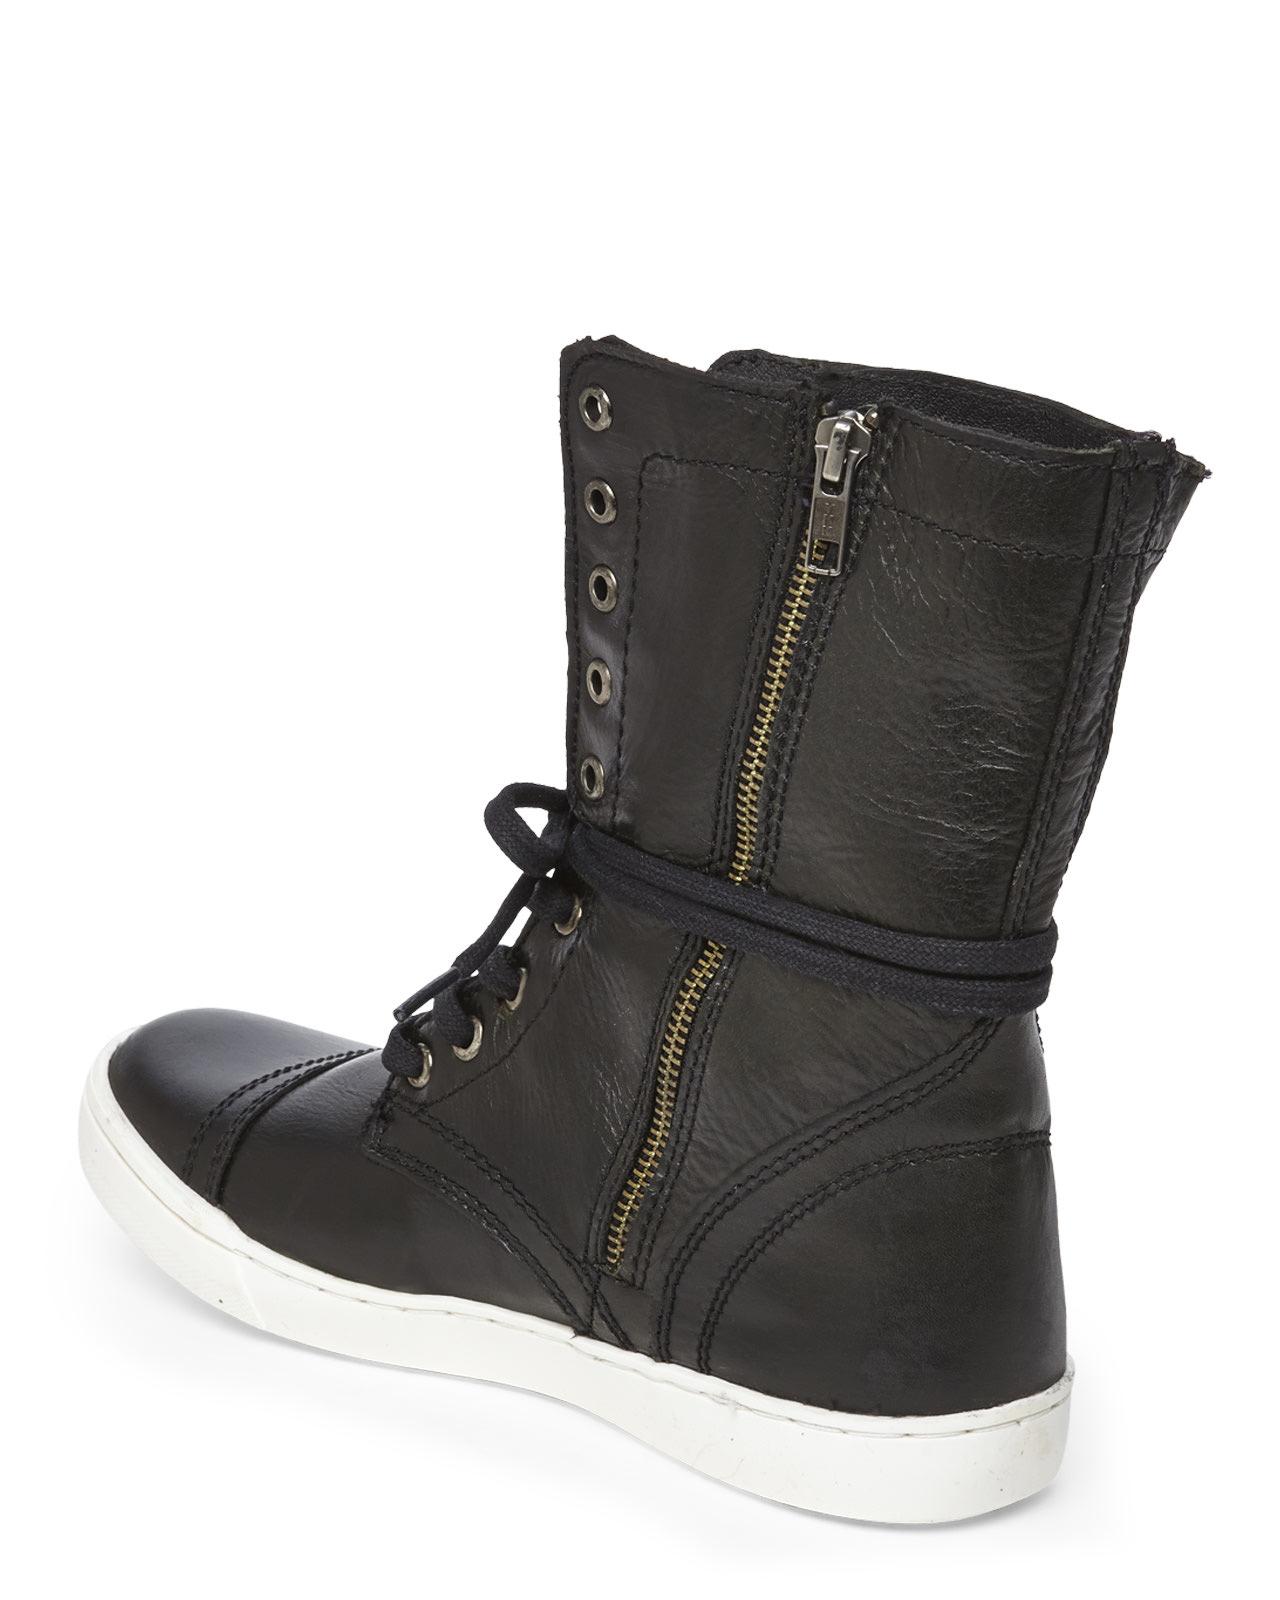 c8f23d014c6 Lyst - Steve Madden Black Resolvve Sneaker Boots in Black